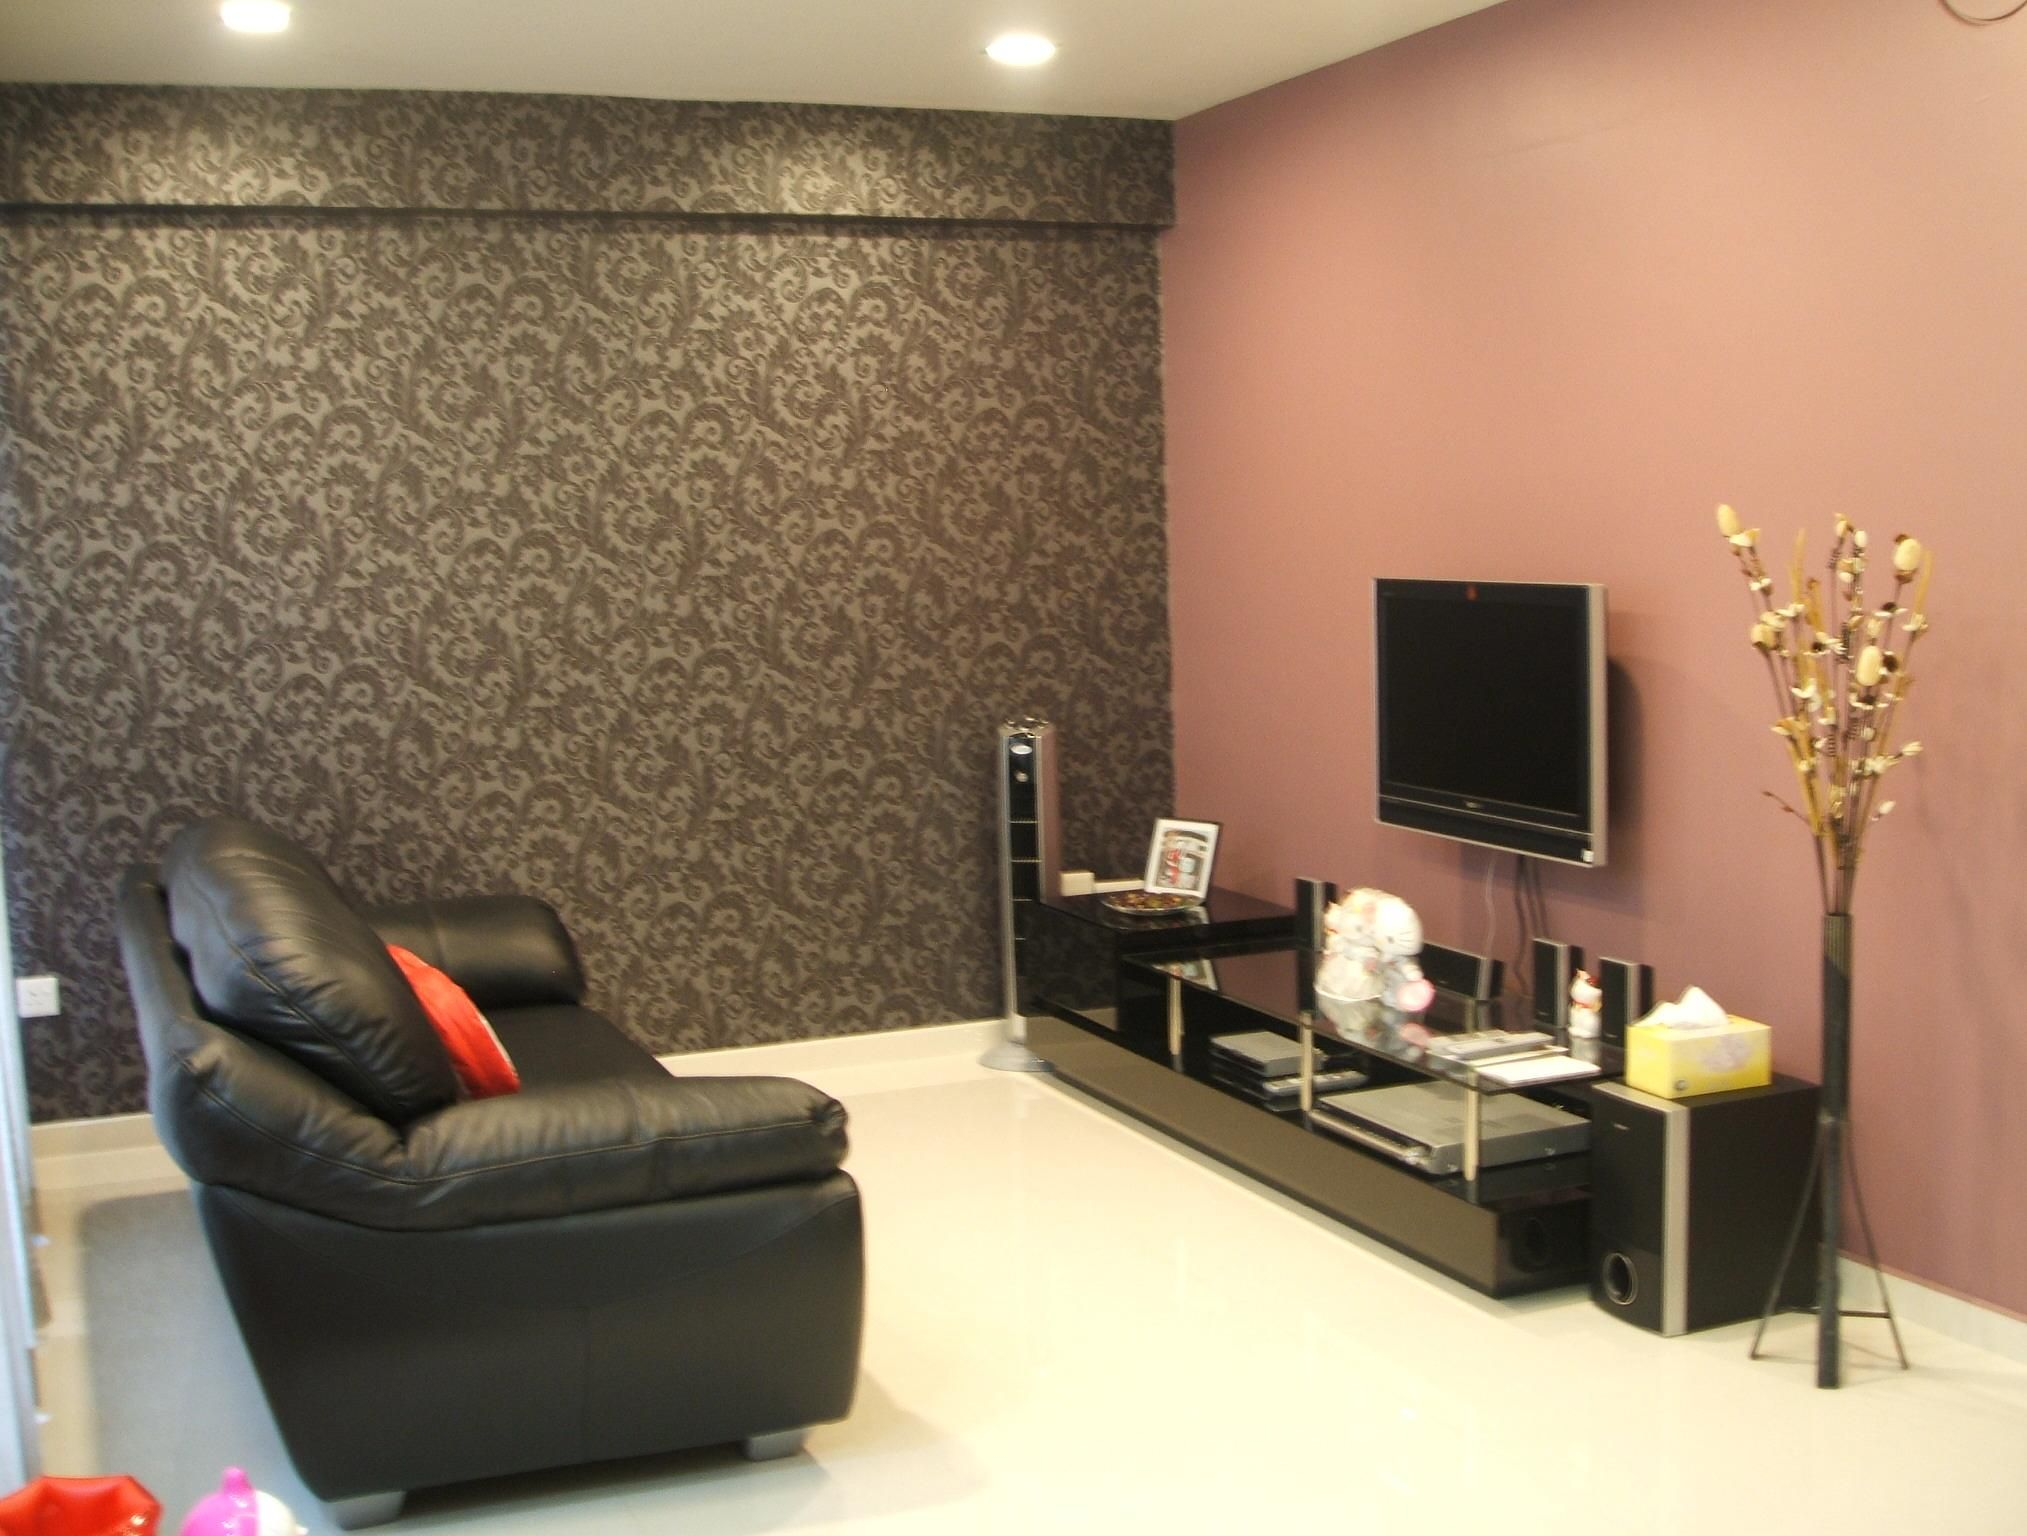 Bedroom Tv Room Design Idea Also Beautiful Sofa Design Idea Then